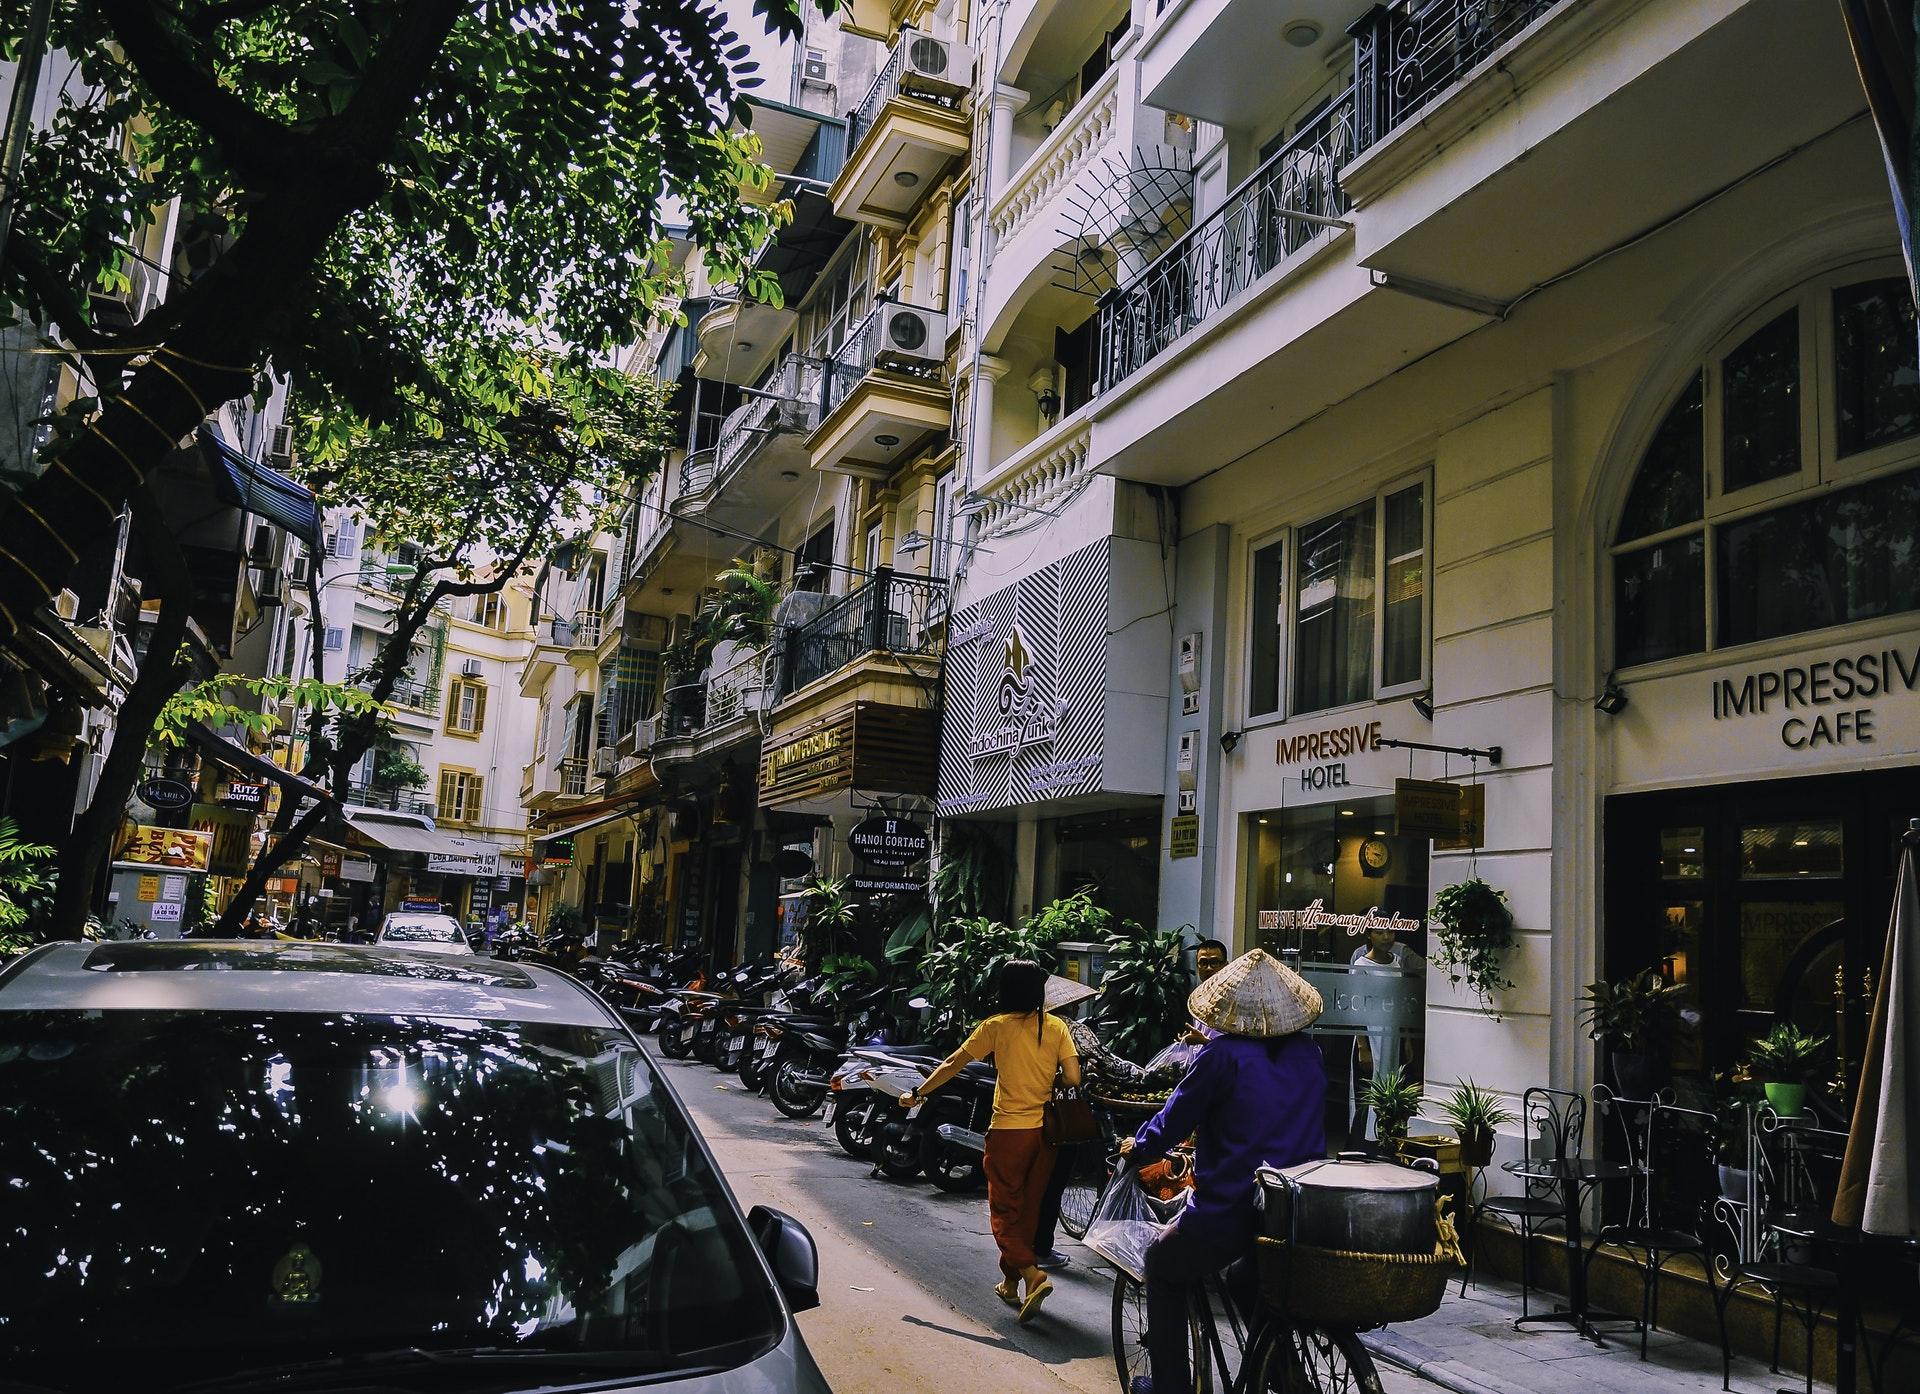 Vietnam-Street-Car-Bike-Hotel-Cafe